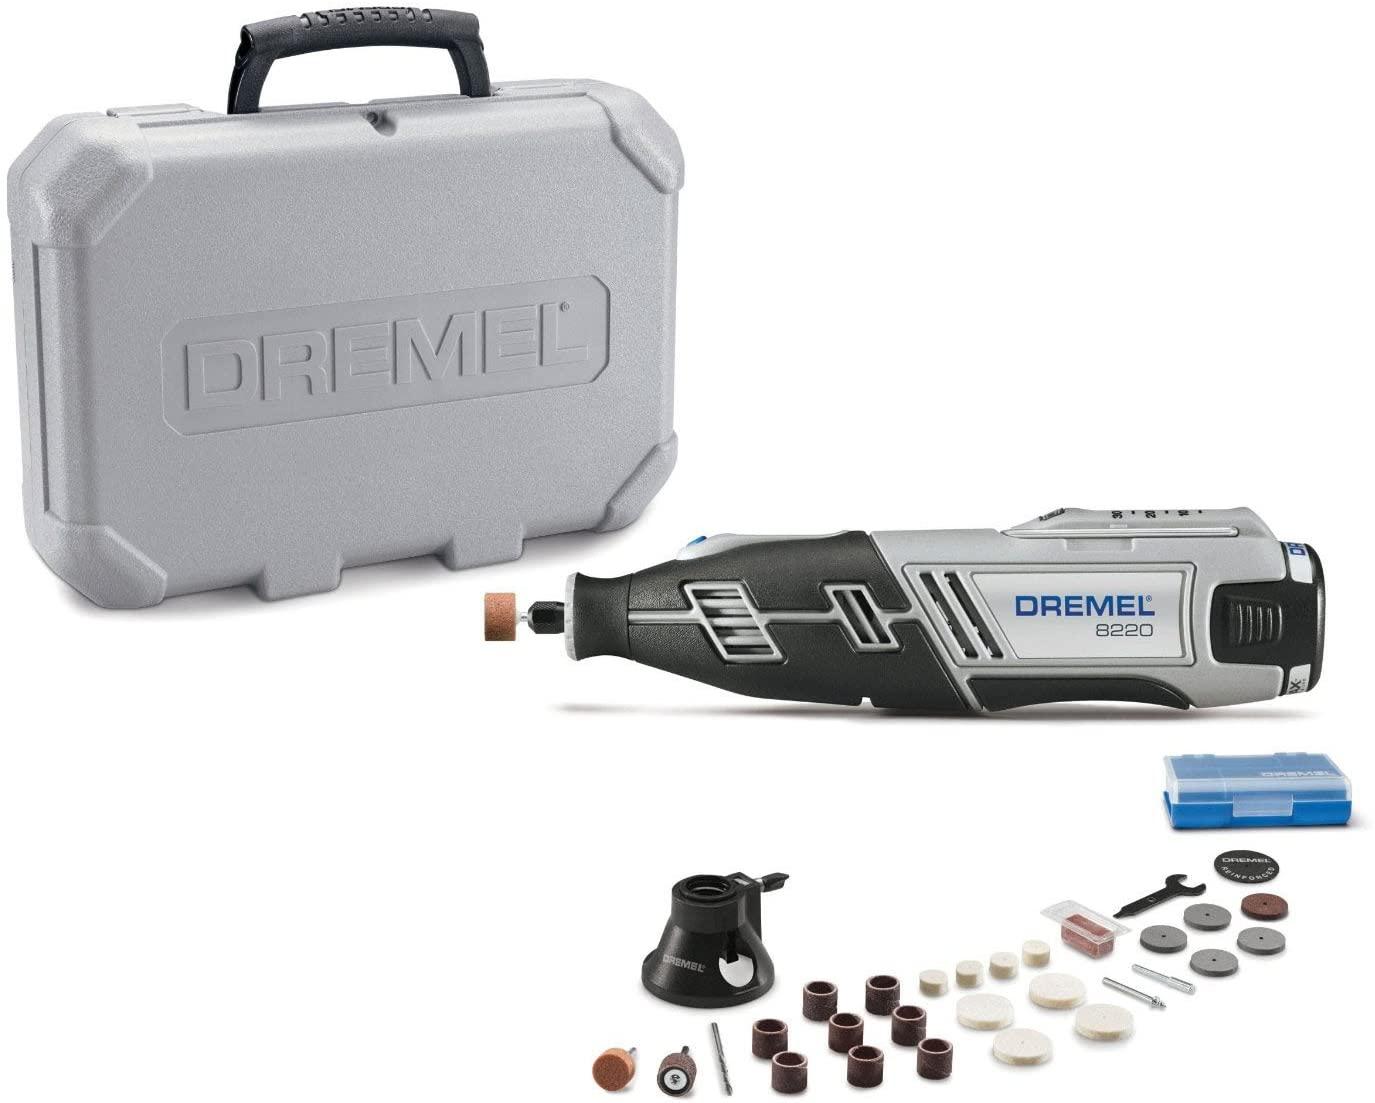 Dremel 8220 Rotary Tool